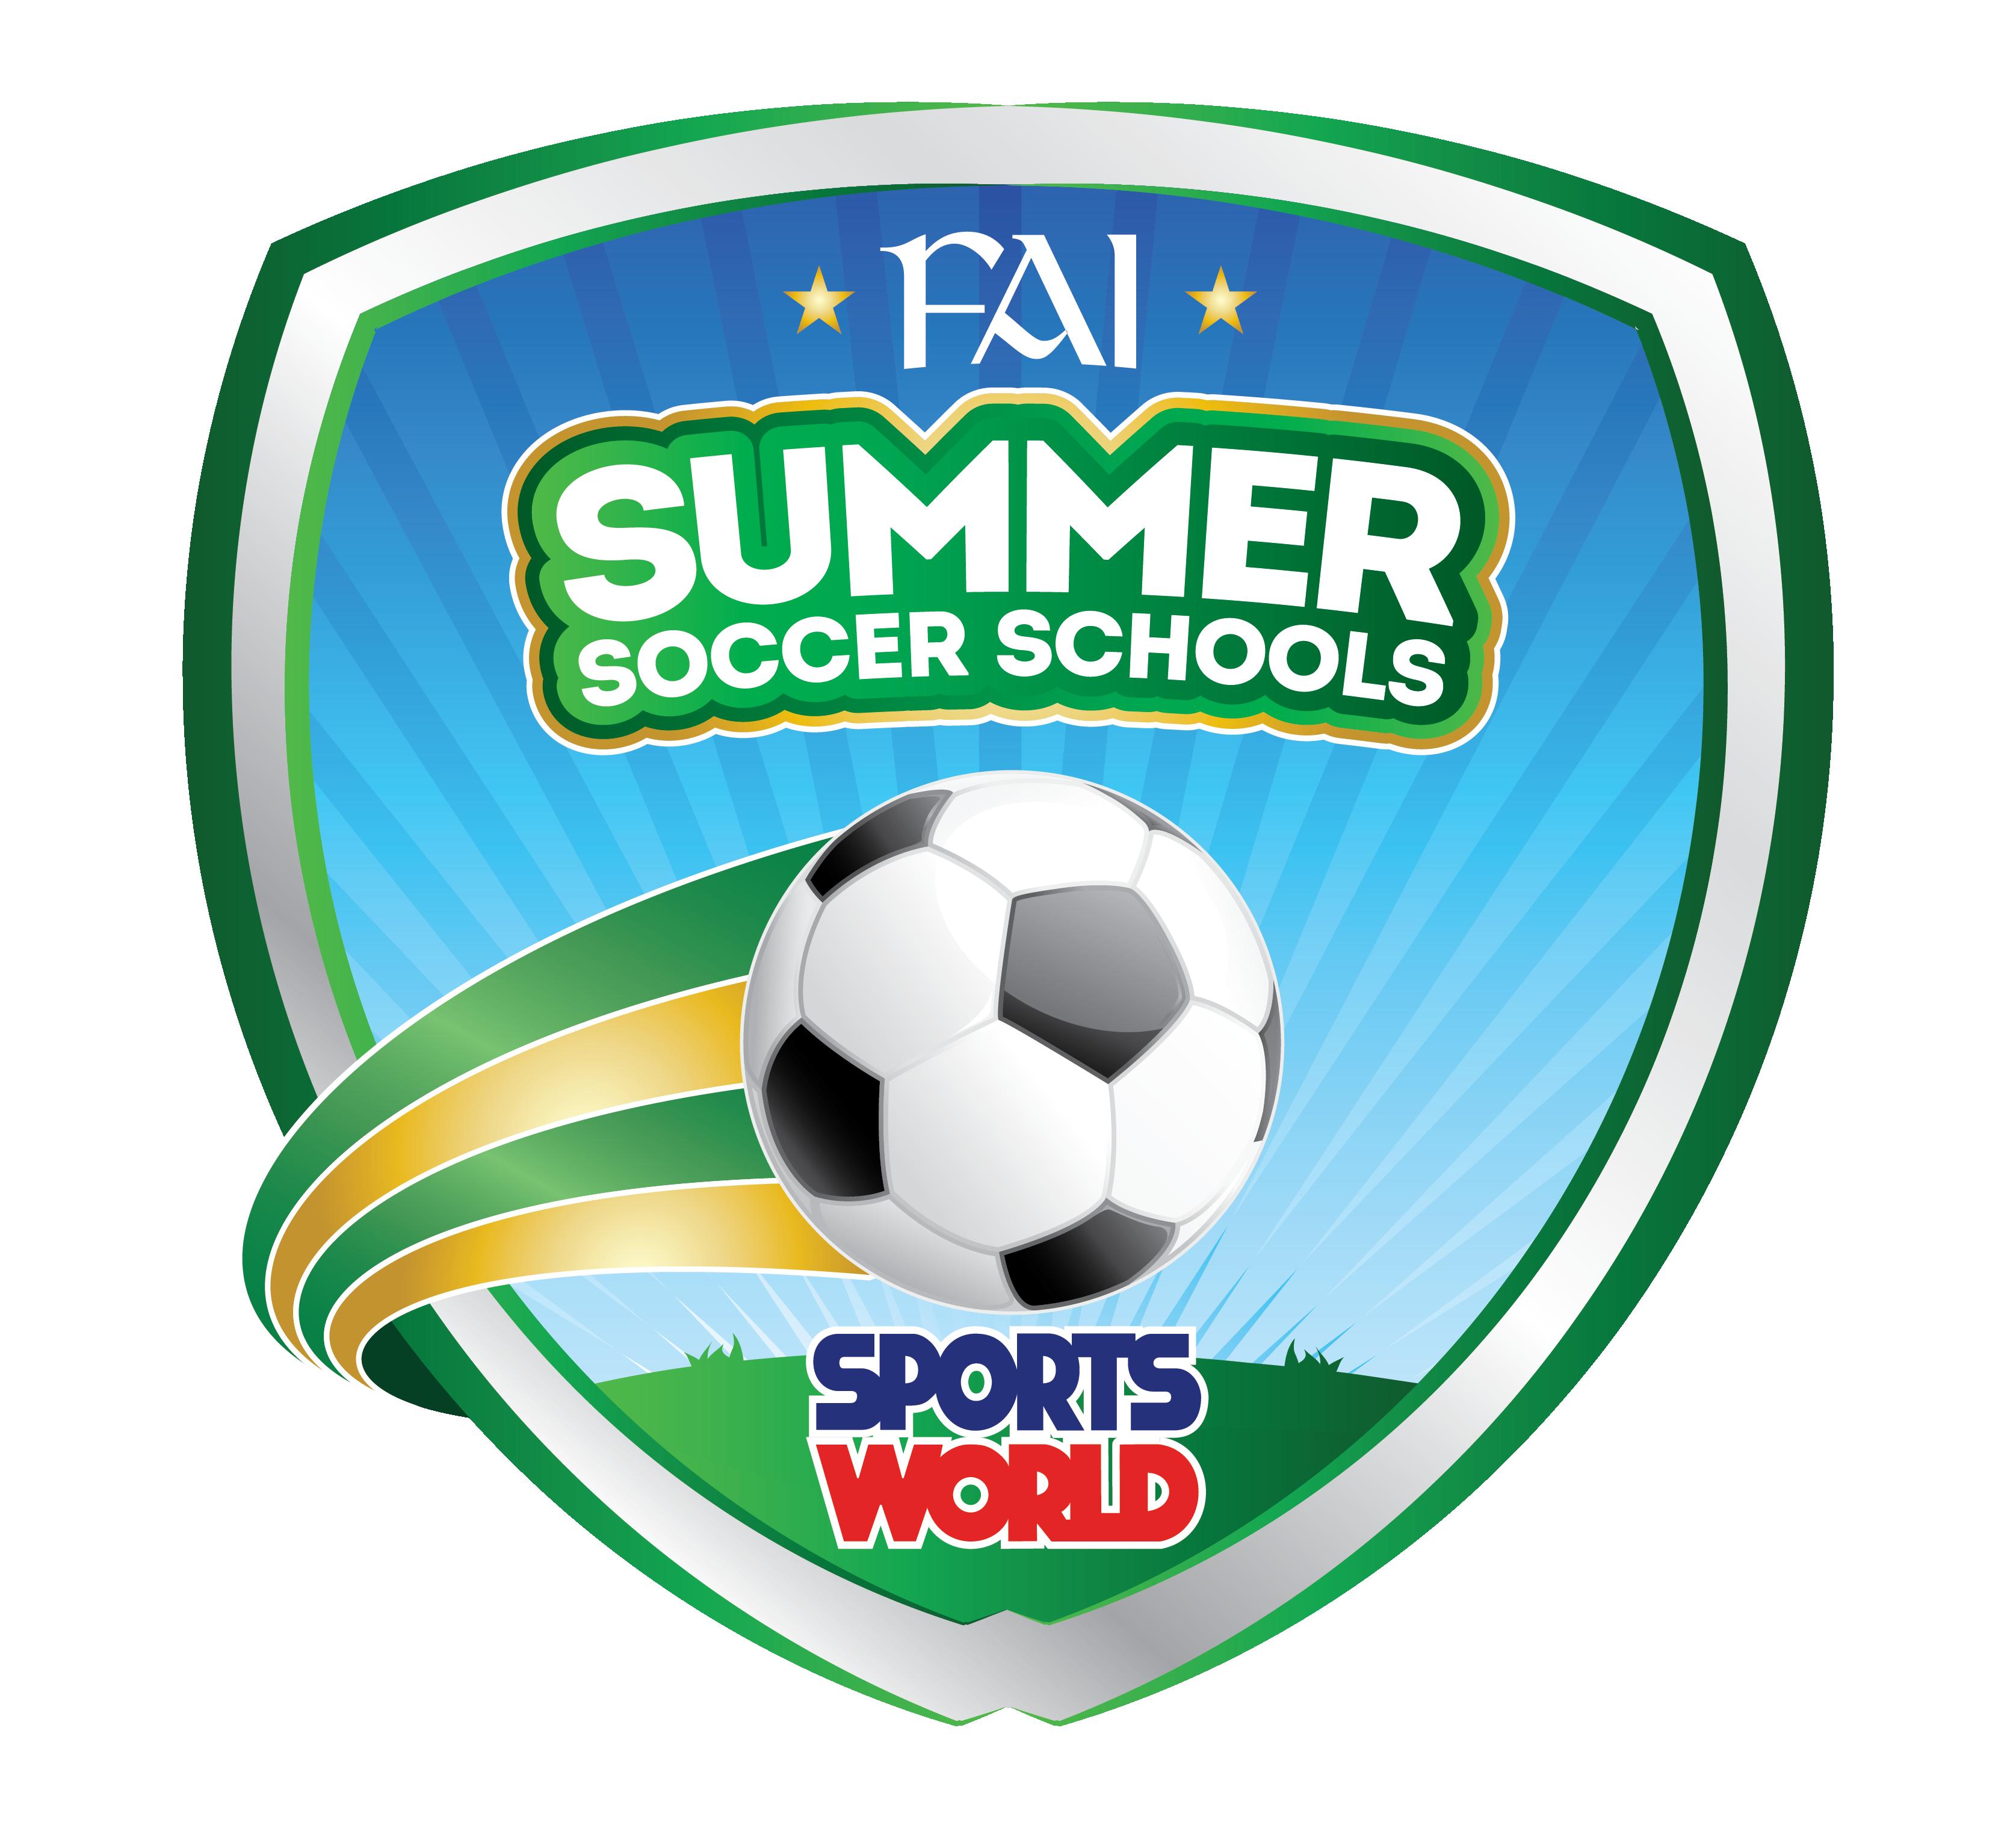 Fai Summer Soccer Schools Kerry District League